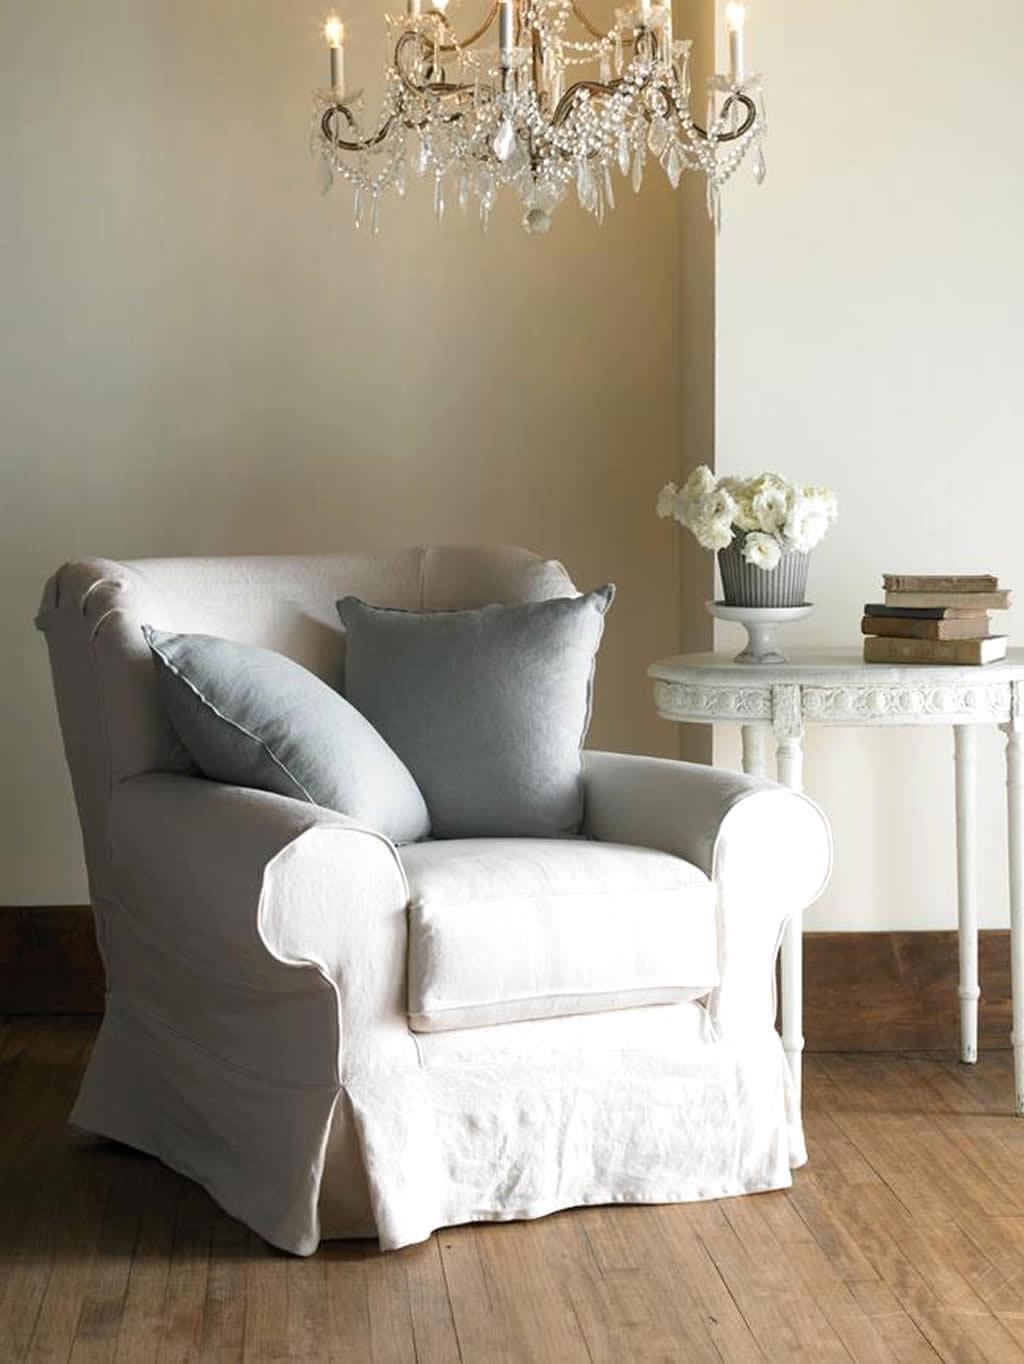 Shabby-Chic-Northampton-Chair-Seating-Furrniture-Design-by-Rachel-Ashwell.jpg